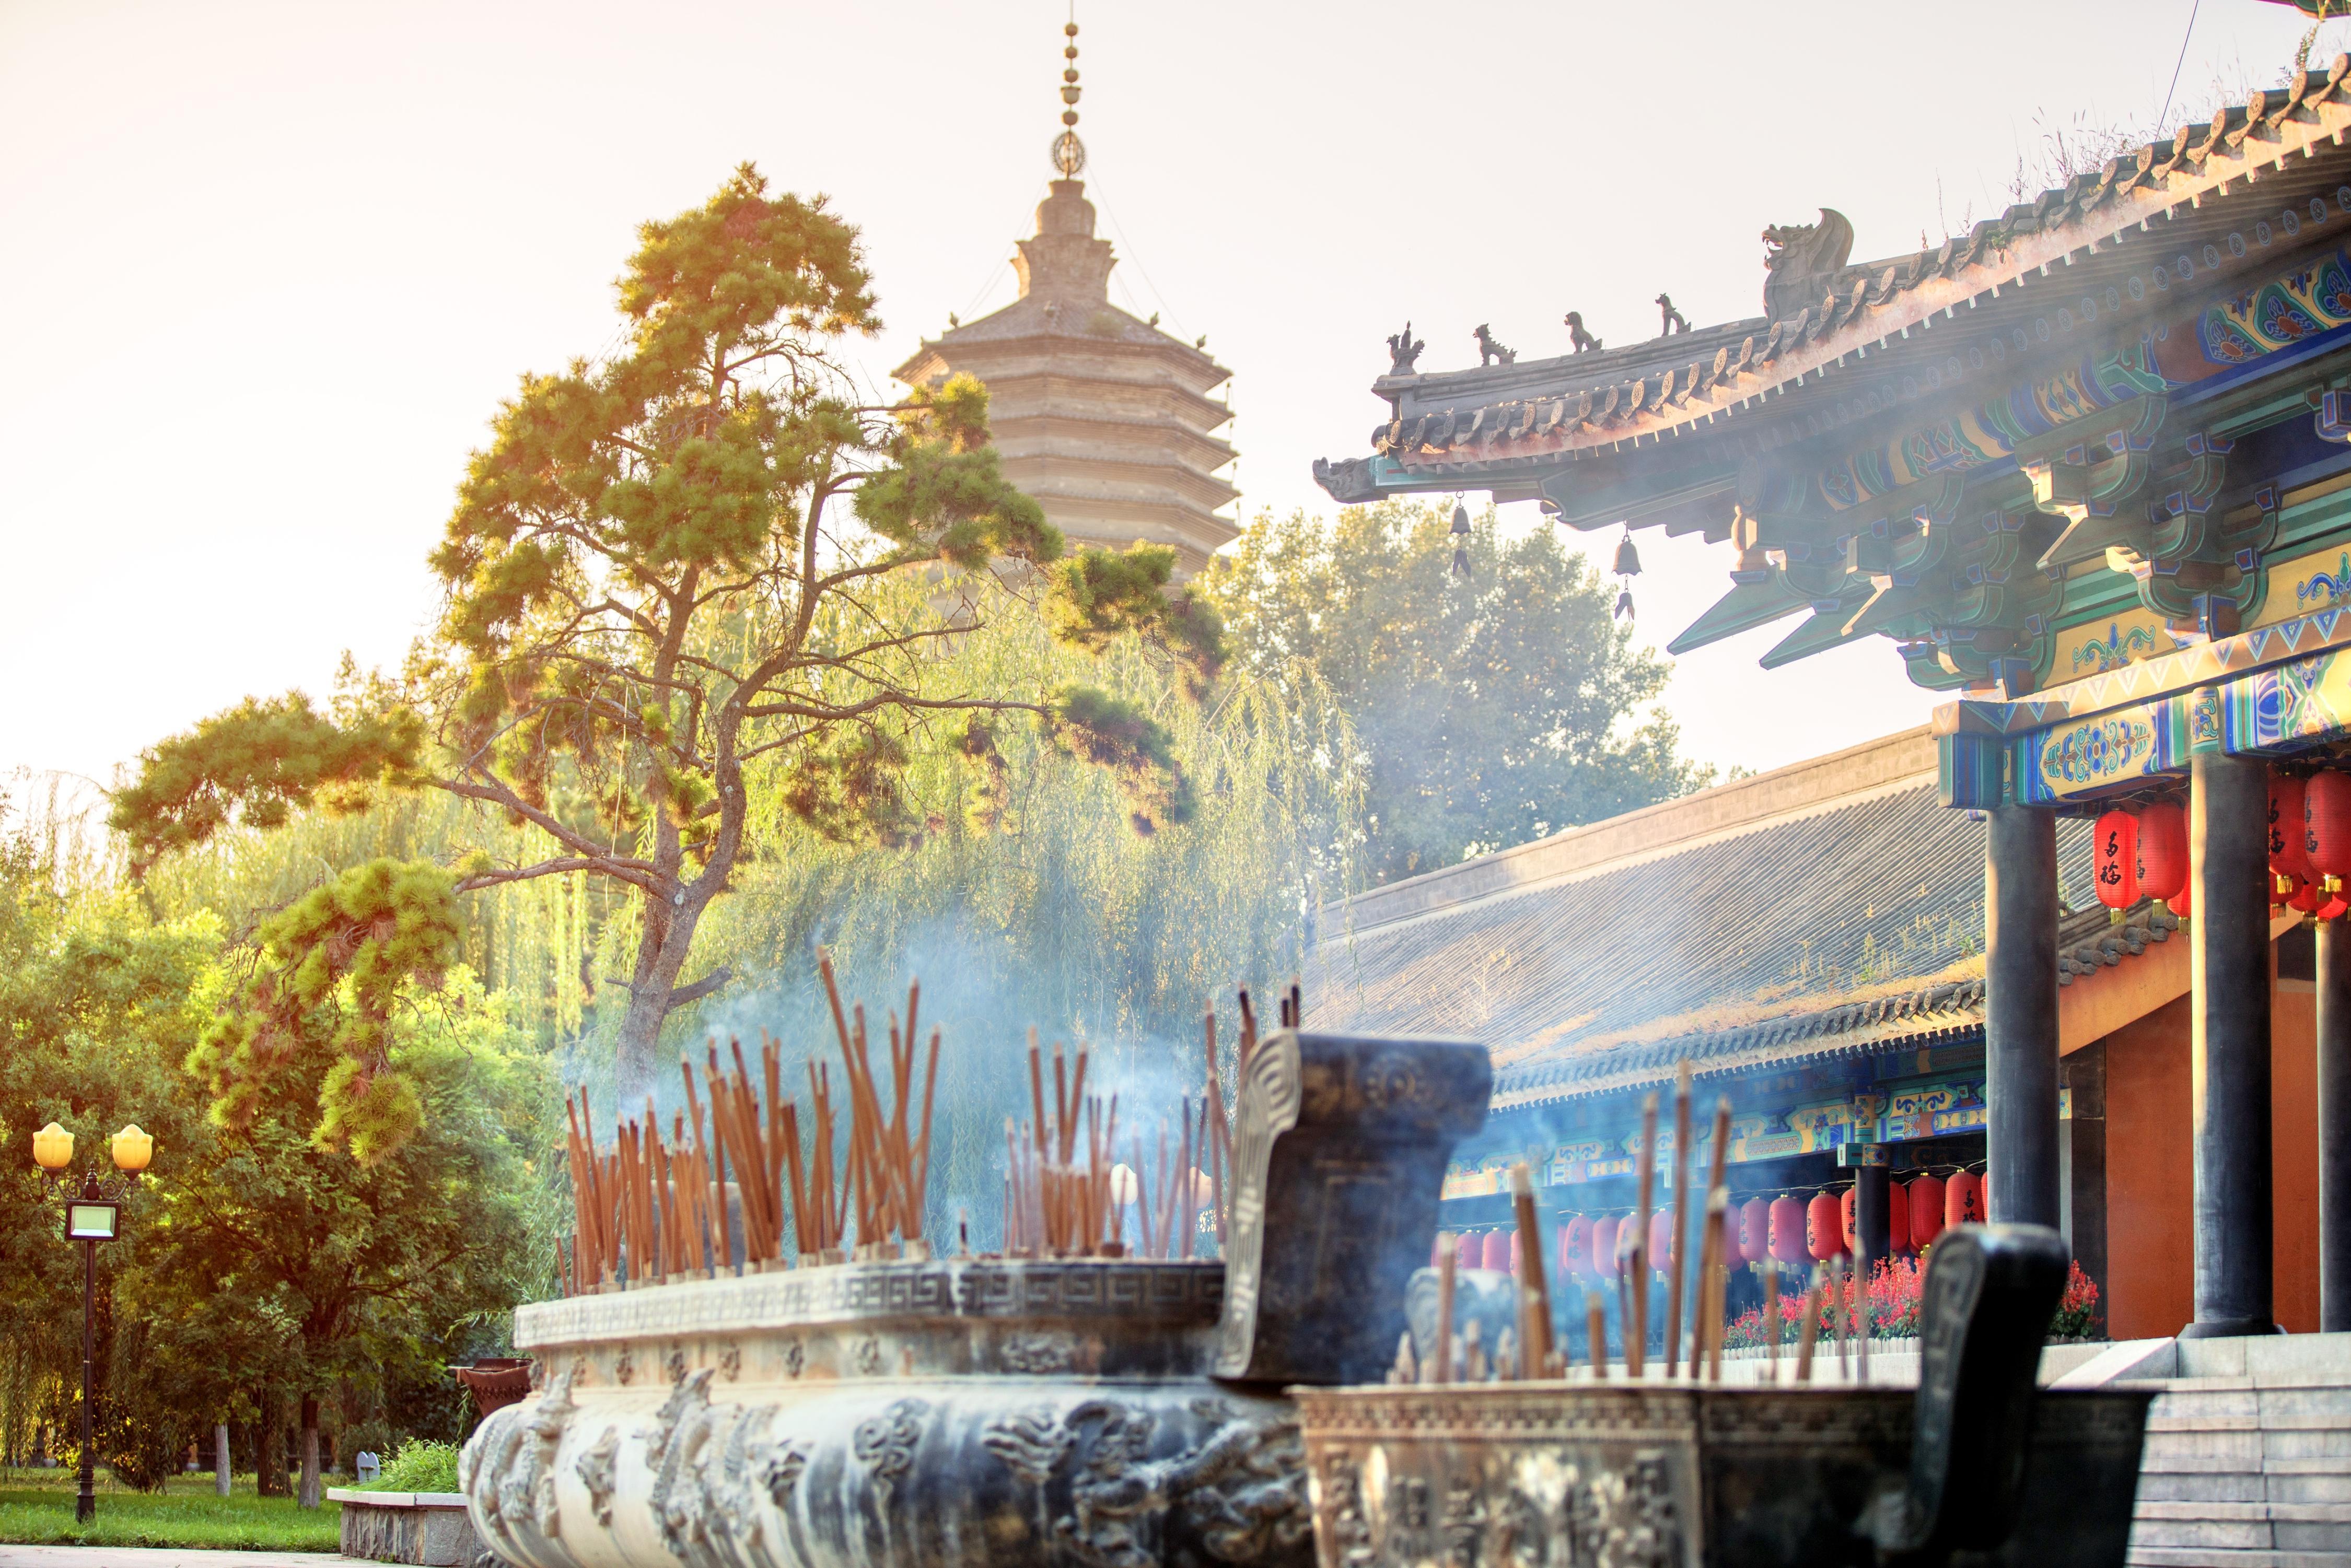 Guangyou Temple